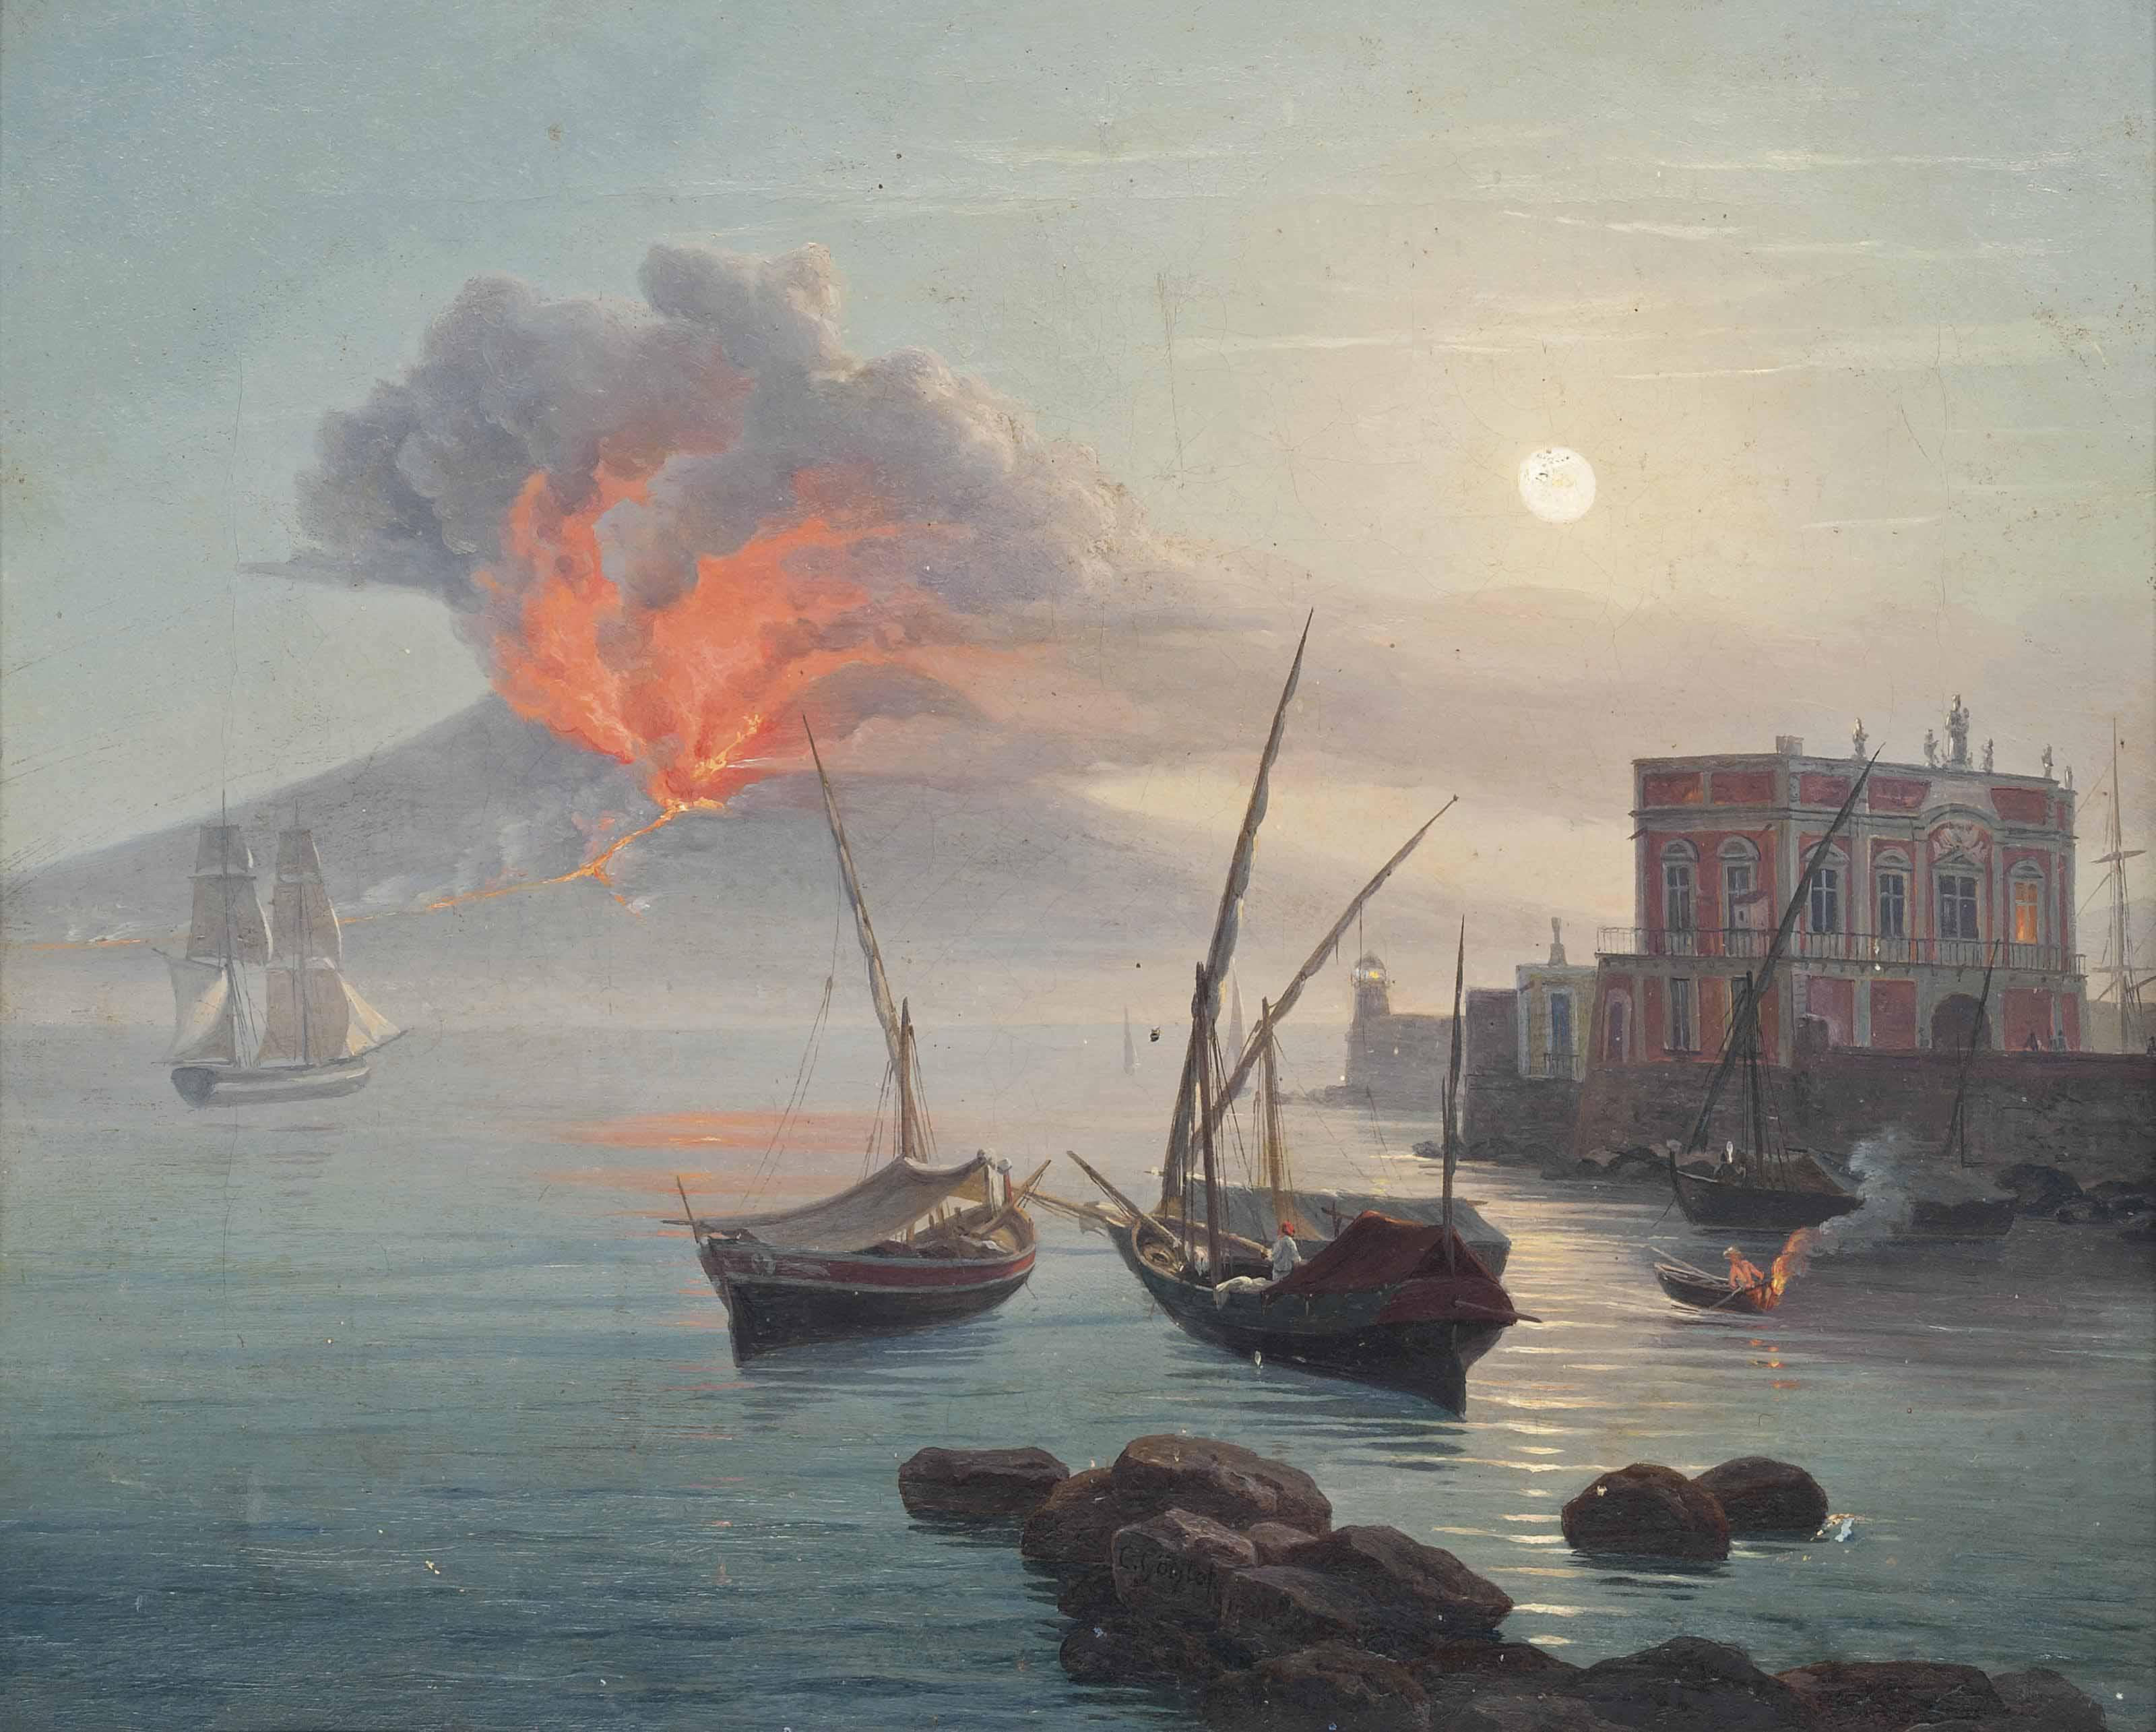 The eruption of Vesuvius, 1 May 1855